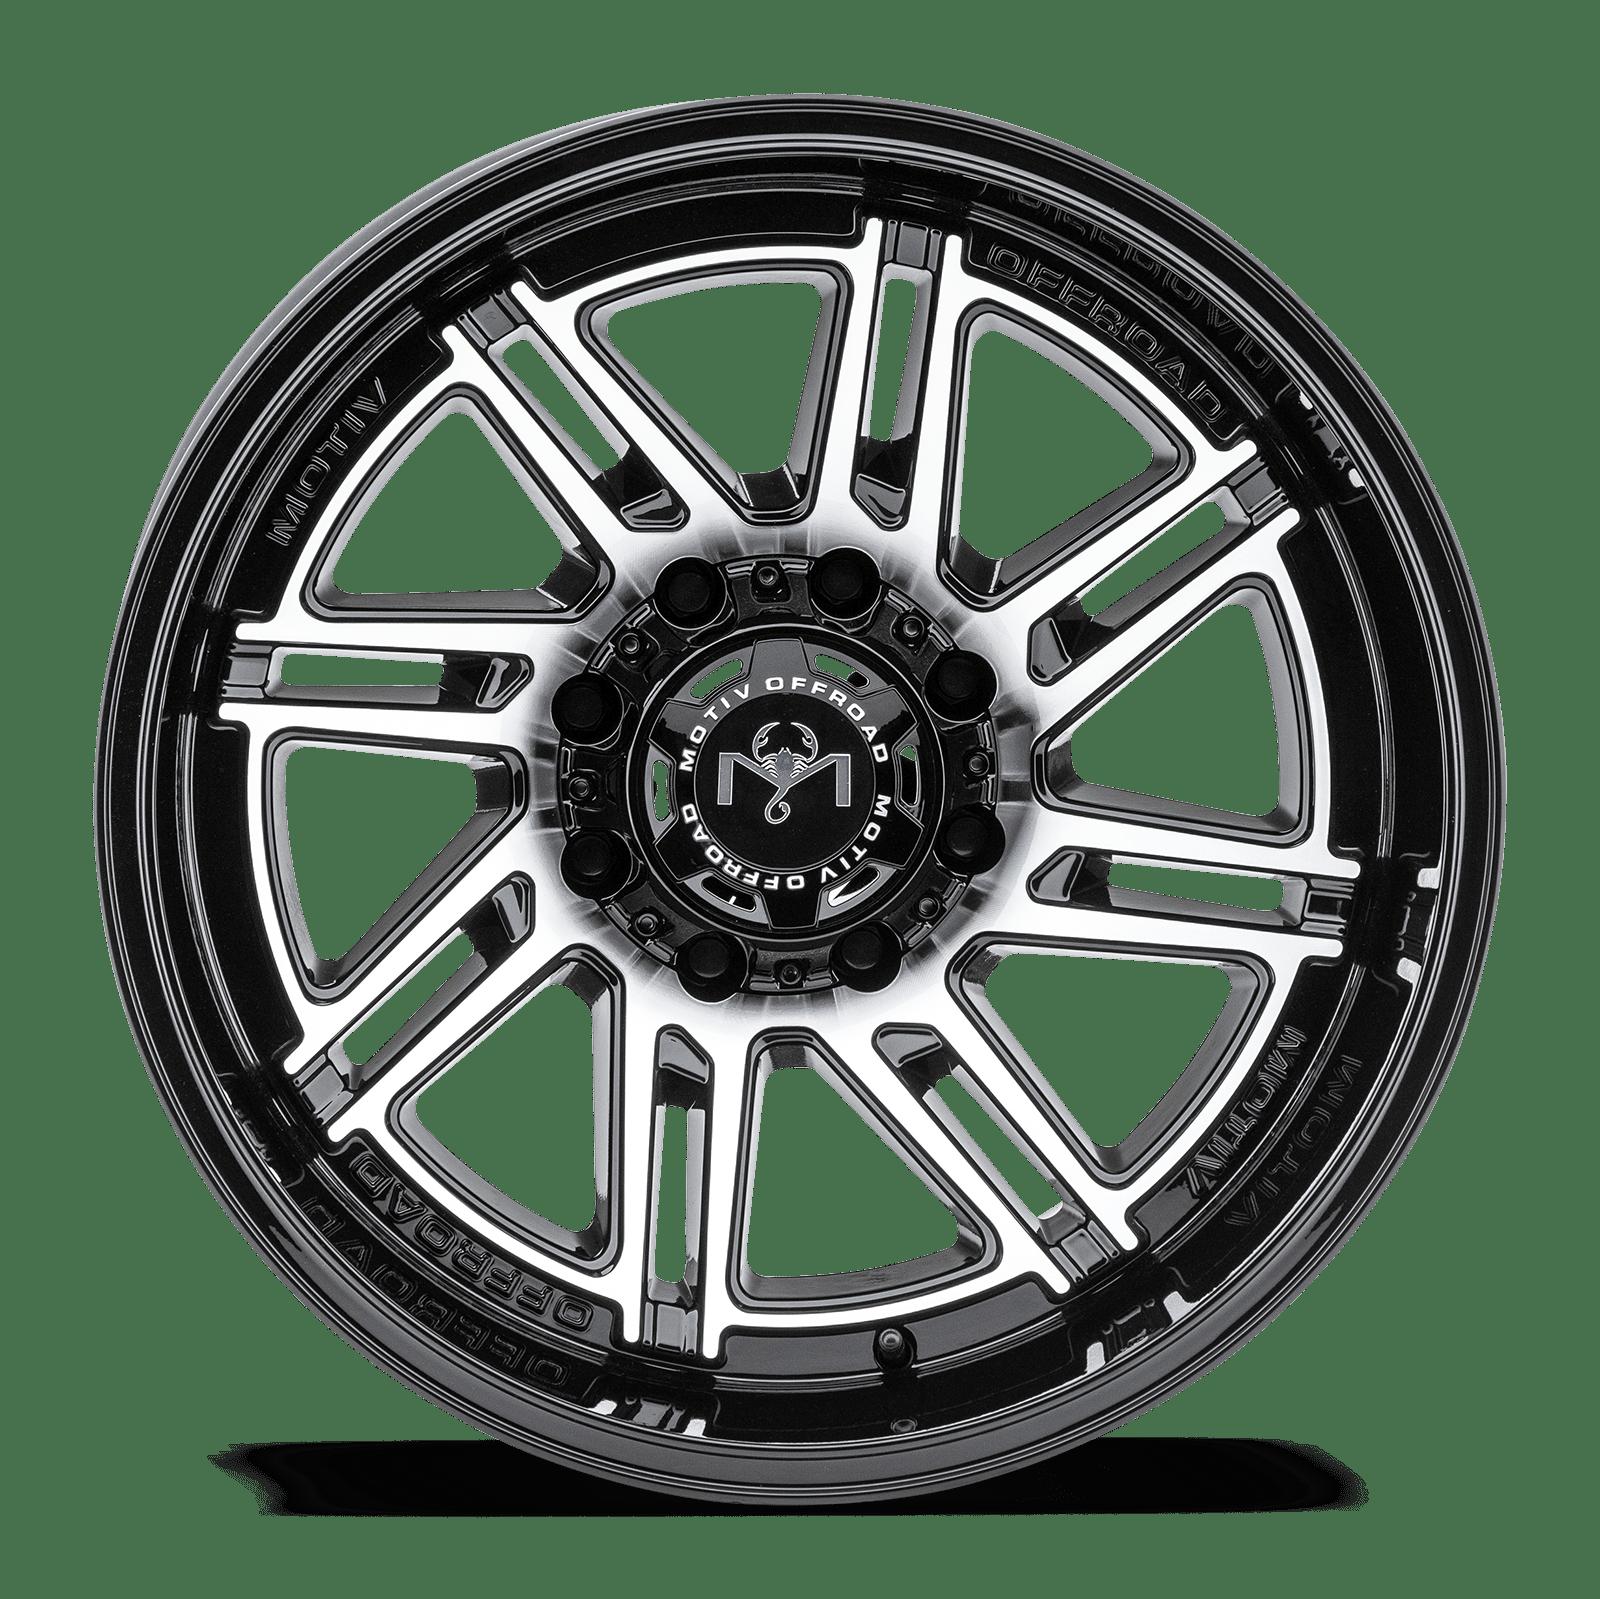 motiv wheels off road millenium 425bm